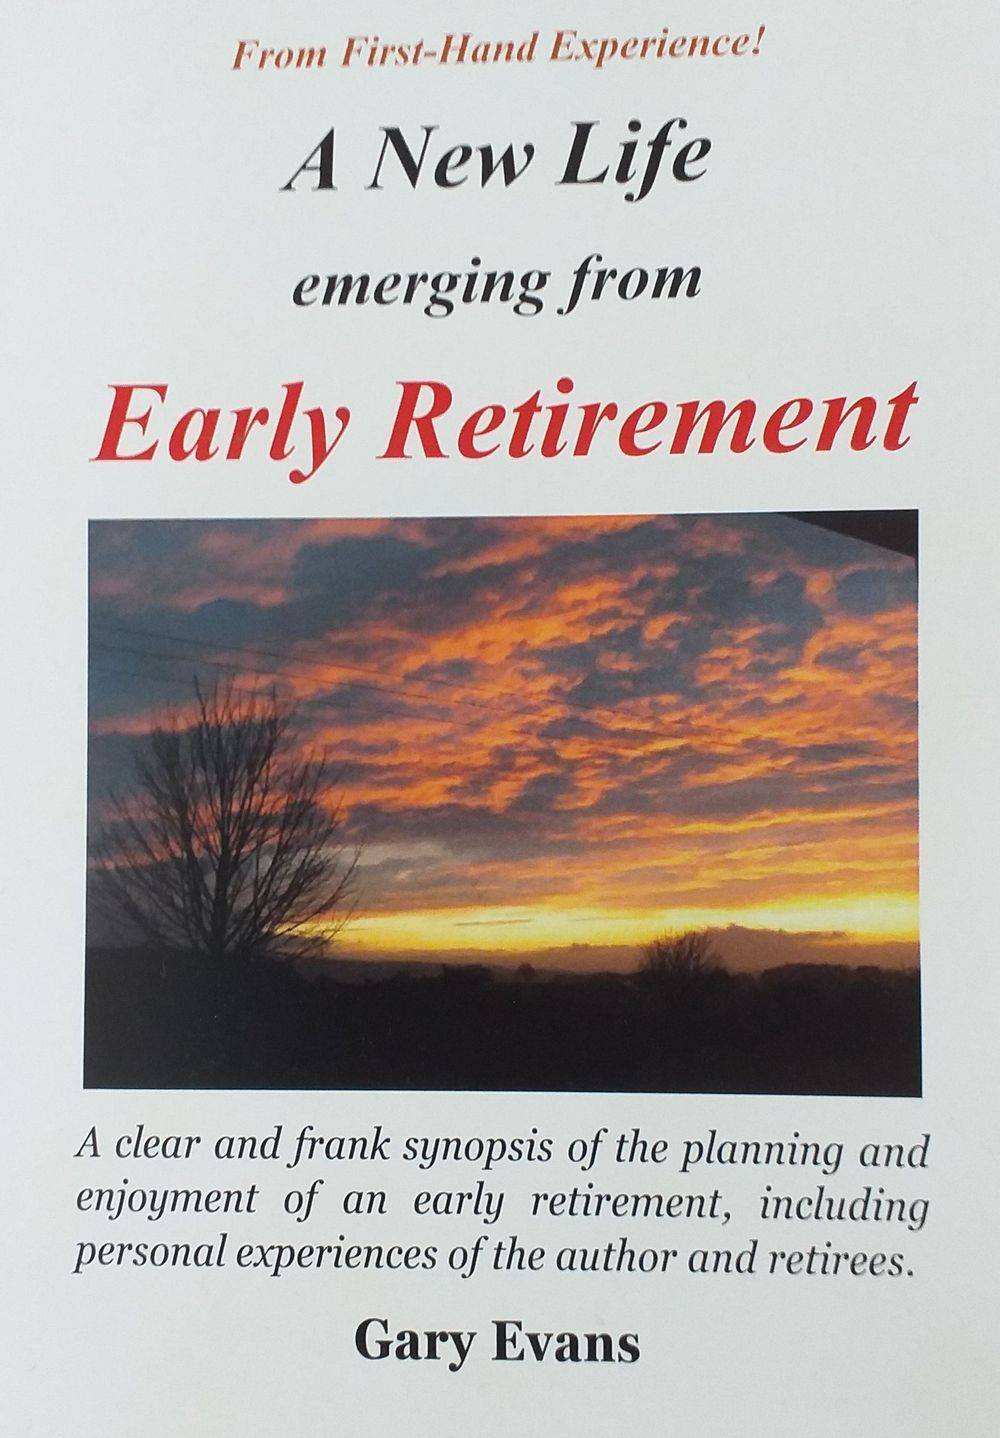 self-help, early retirement